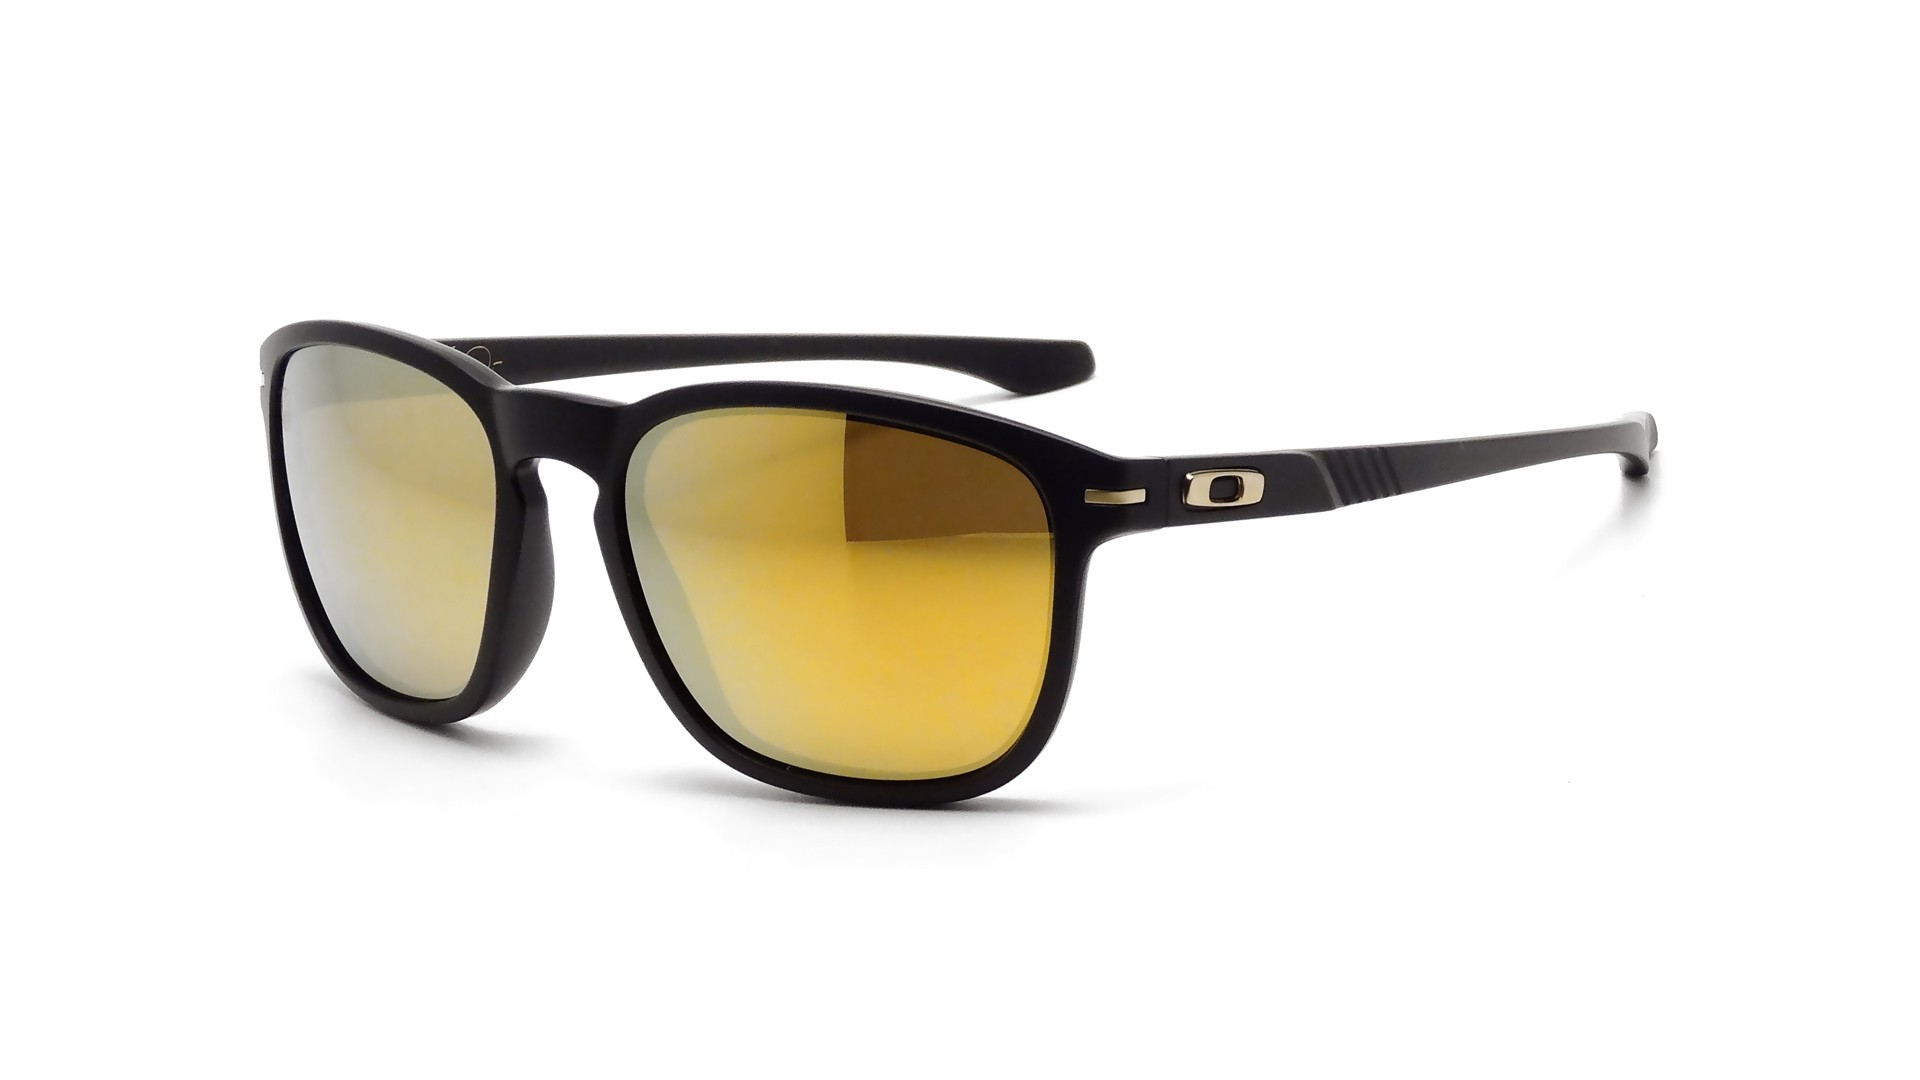 Shaun White Oakley Sunglasses  enduro shaun white signature series black oo9223 04 55 visiofactory